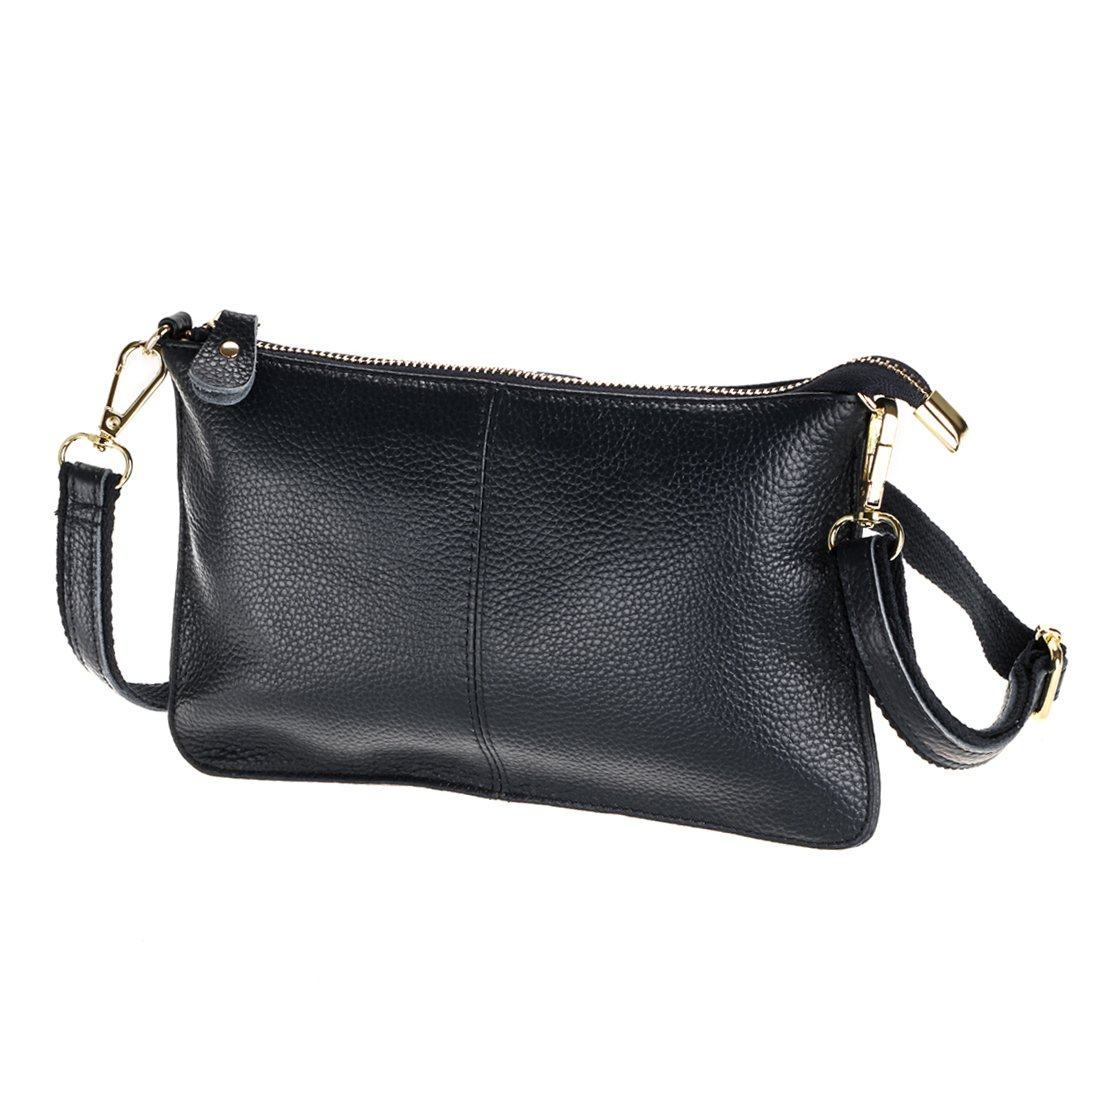 SEALINF Women's Cowhide Leather Clutch Handbag Small Shoulder Bag Purse (black)